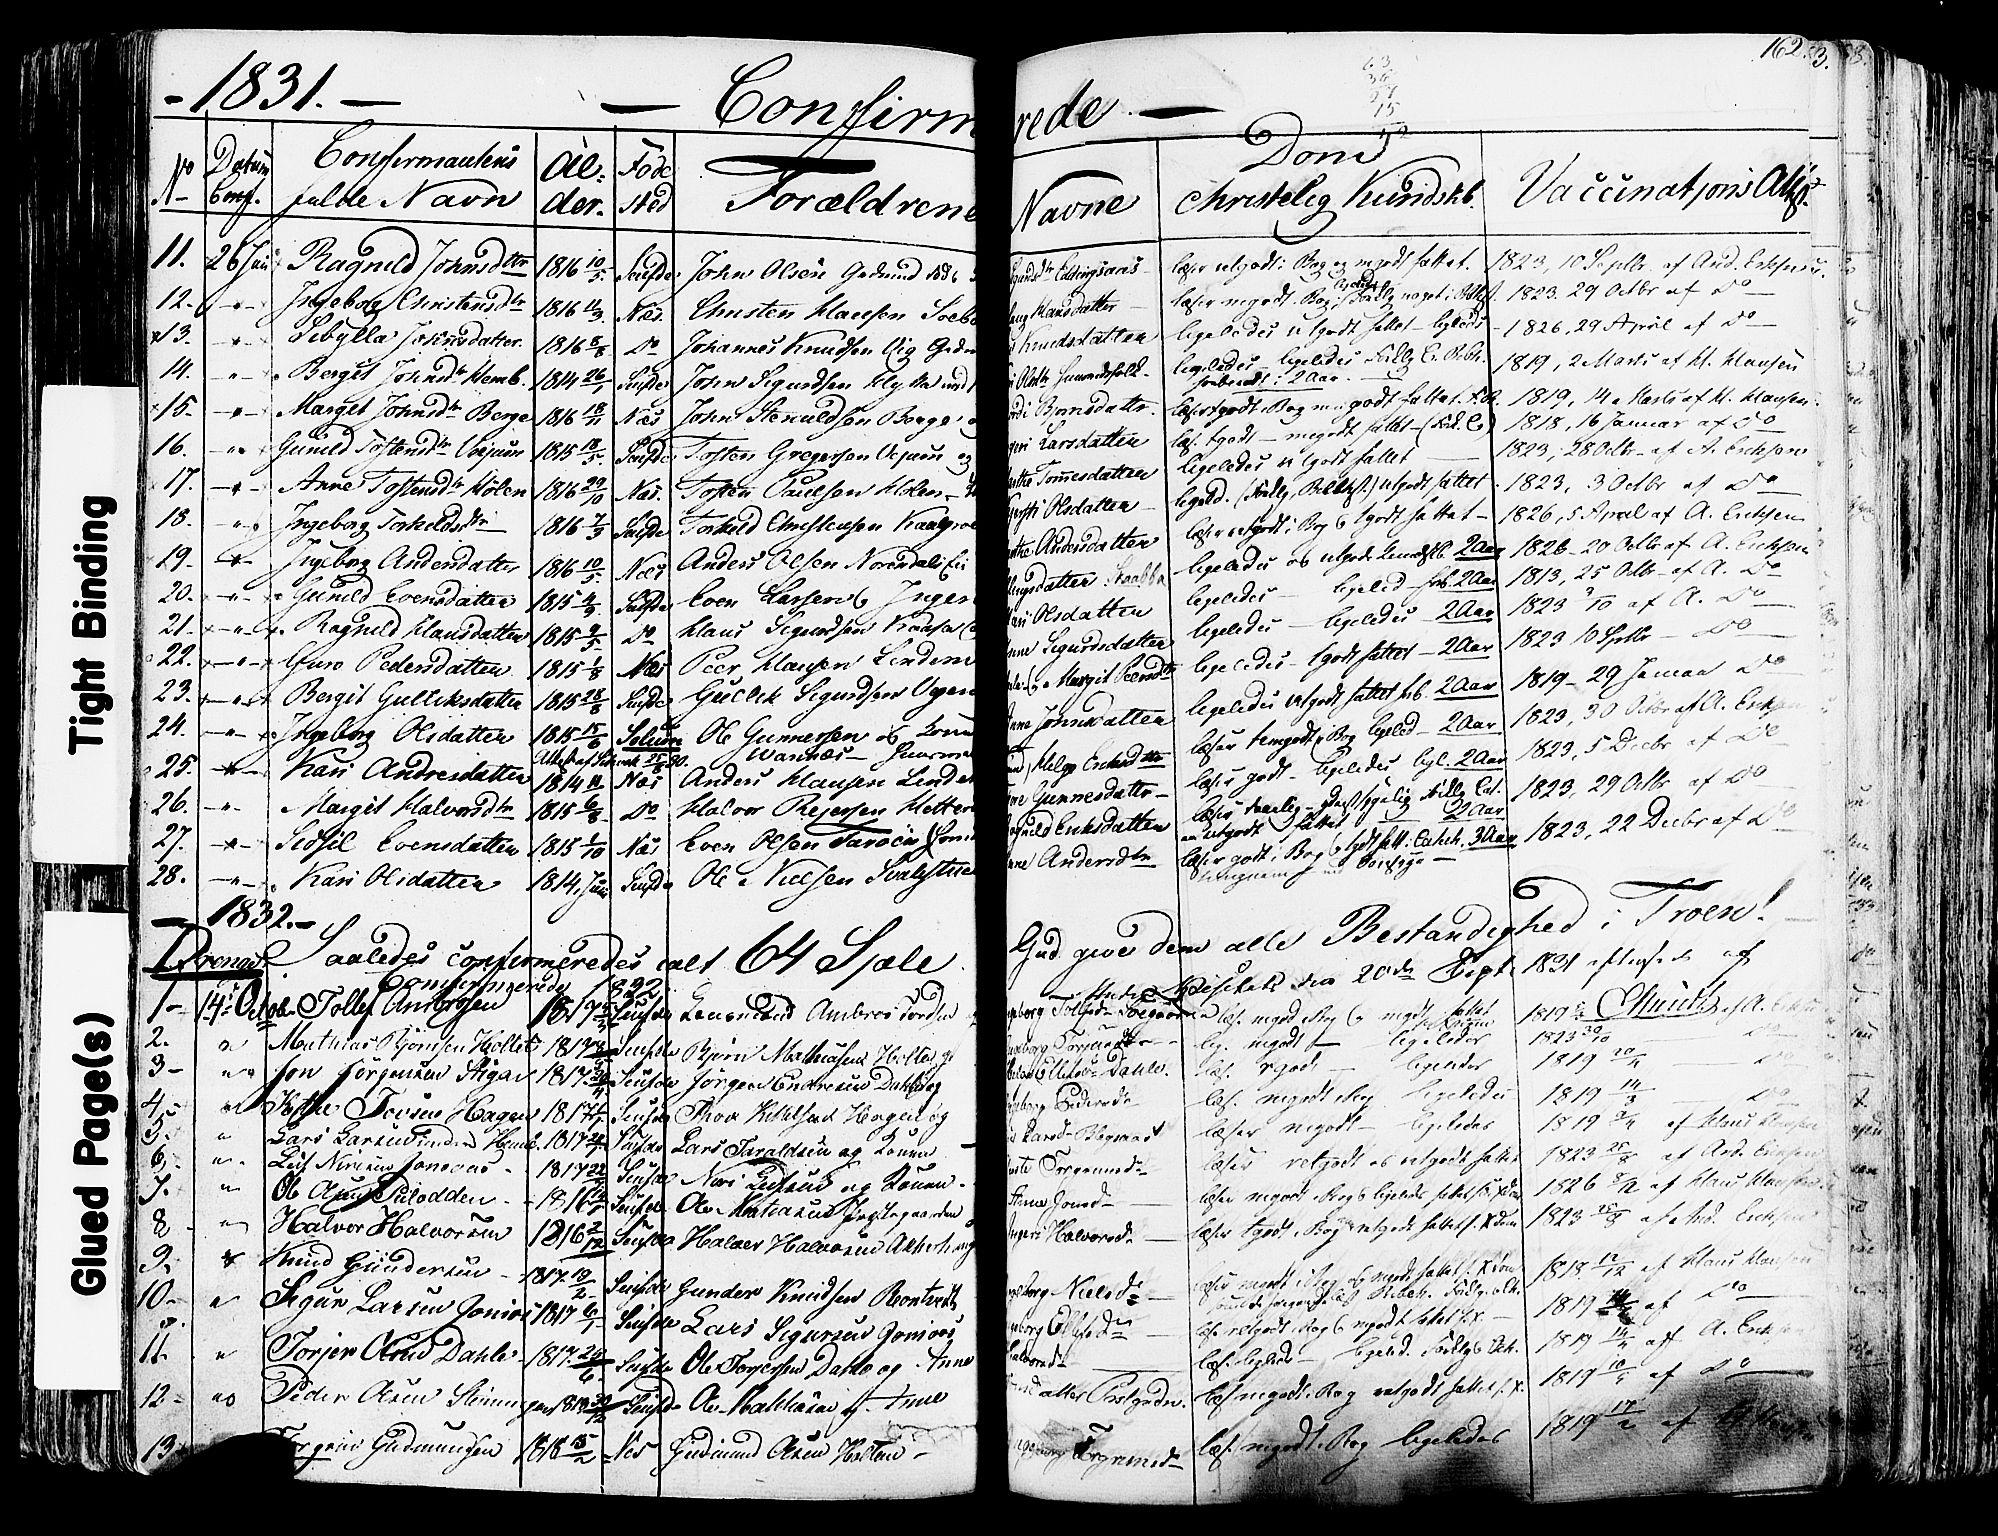 SAKO, Sauherad kirkebøker, F/Fa/L0006: Ministerialbok nr. I 6, 1827-1850, s. 162